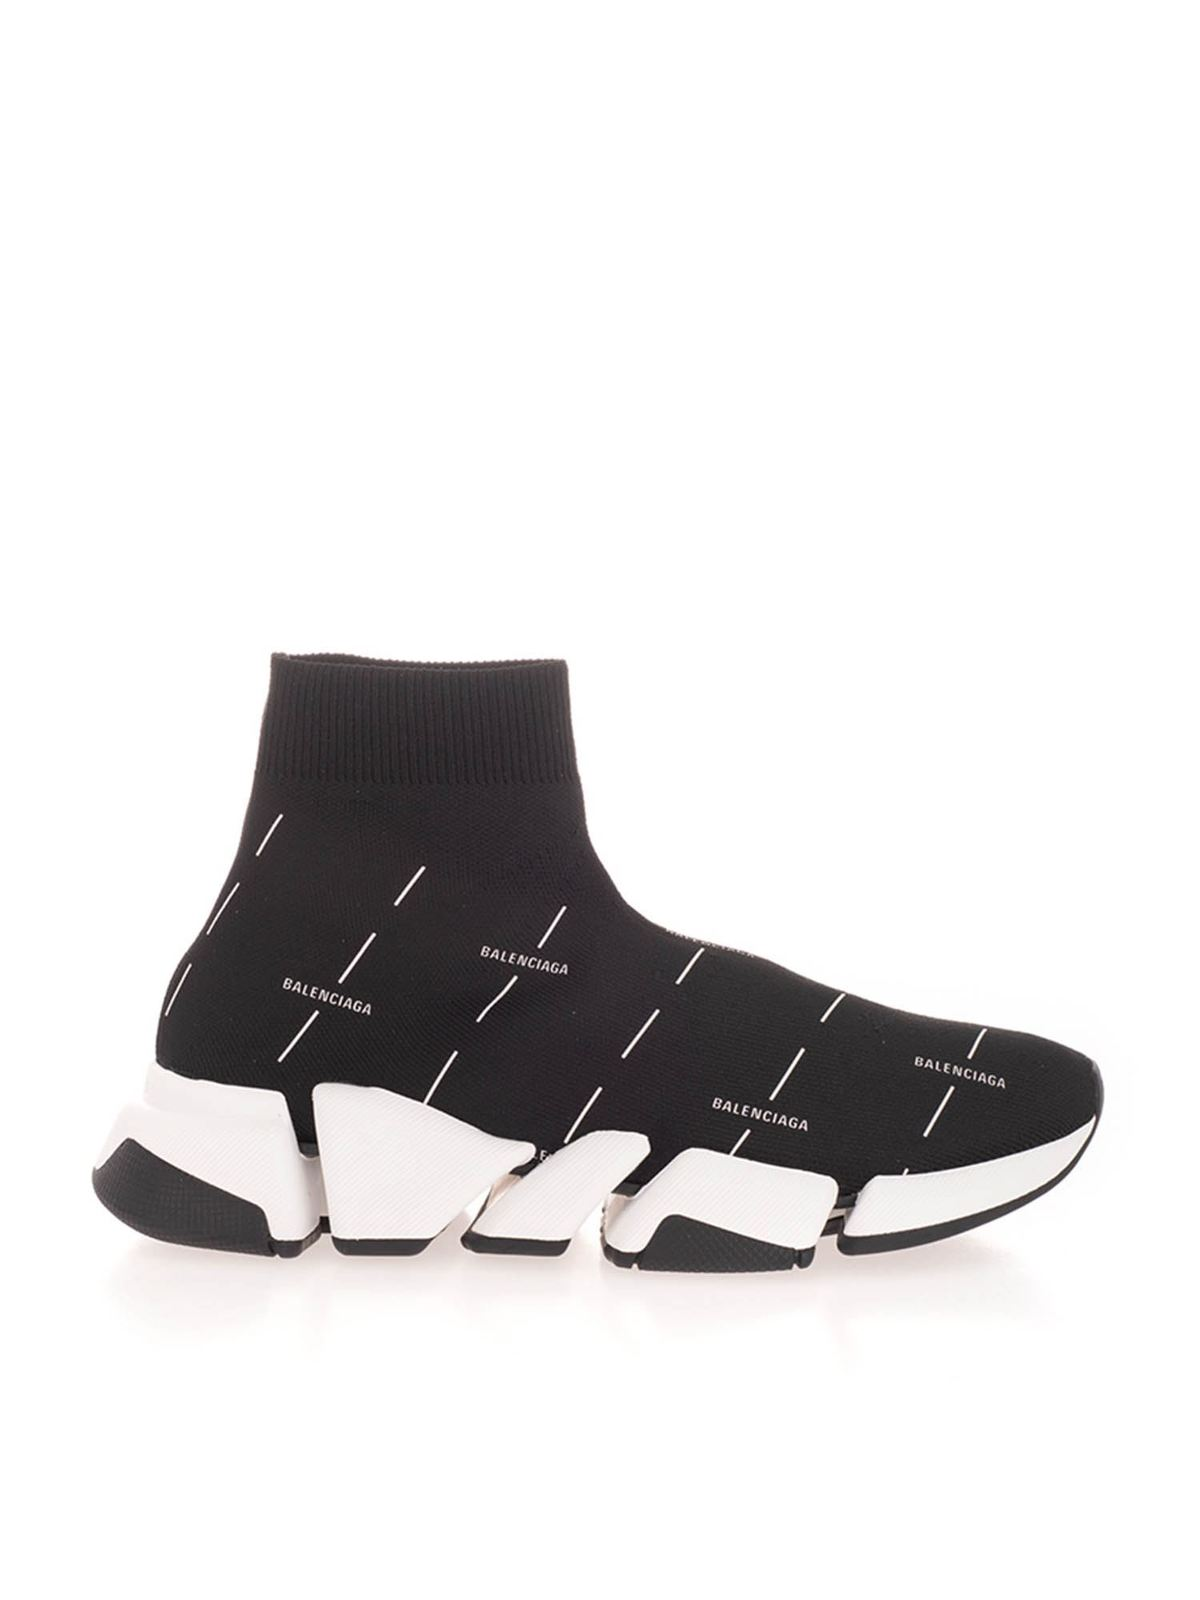 Balenciaga Sneakers SPEED 20 SNEAKERS IN BLACK